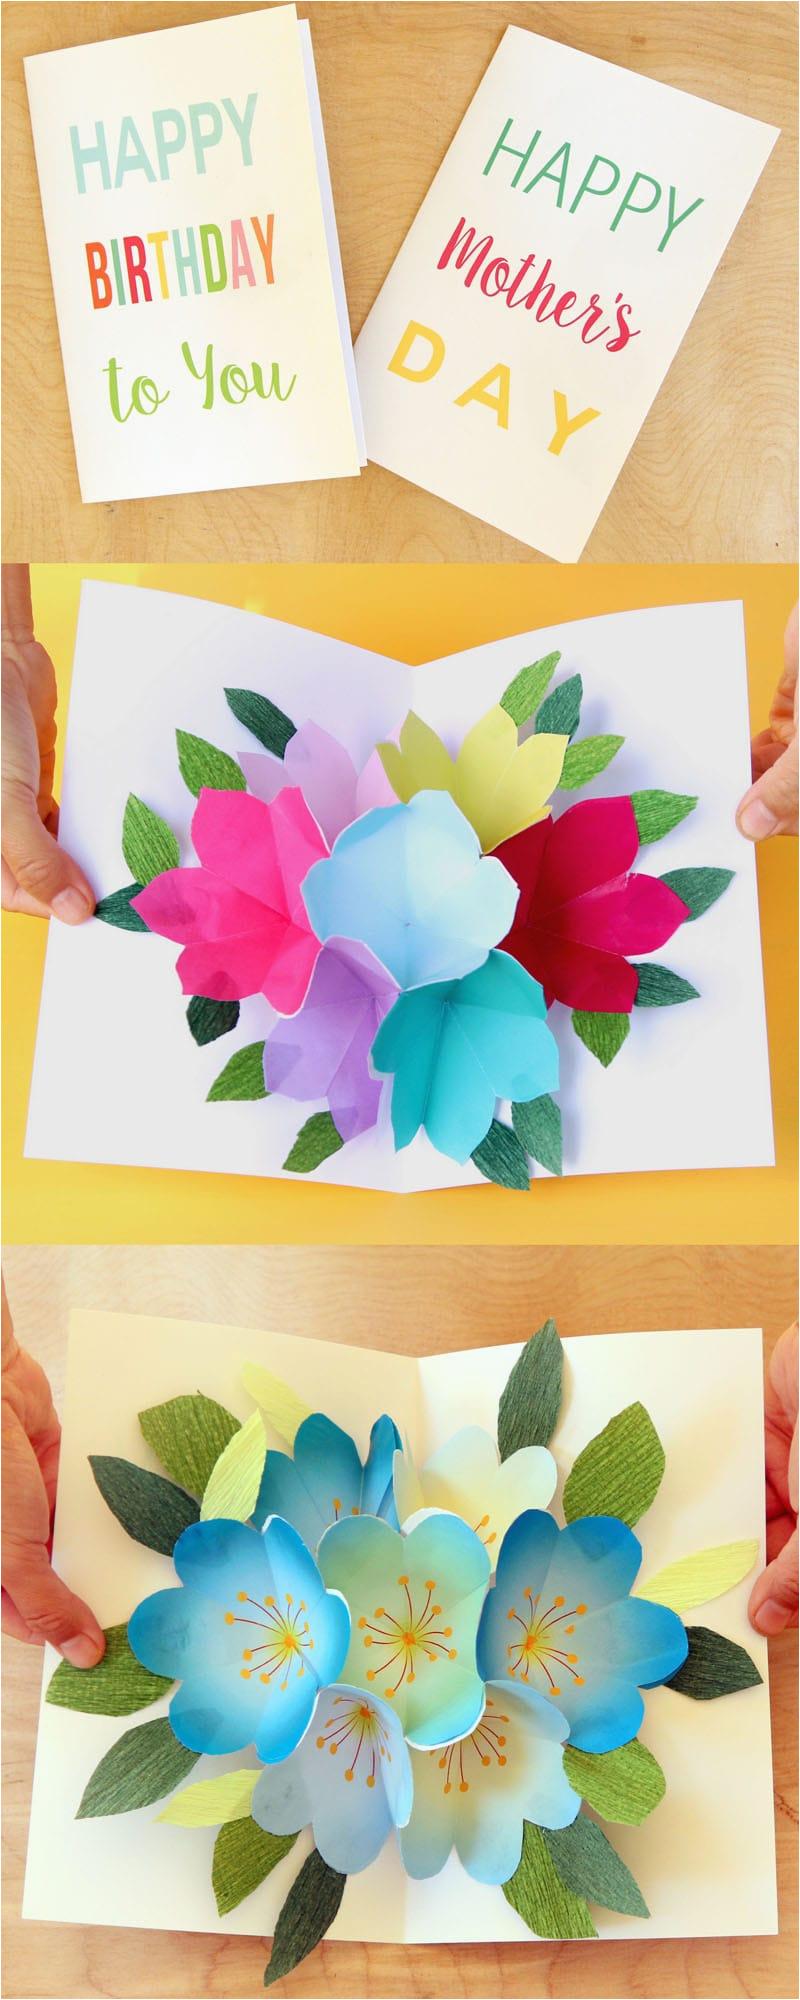 free printable happy birthday card